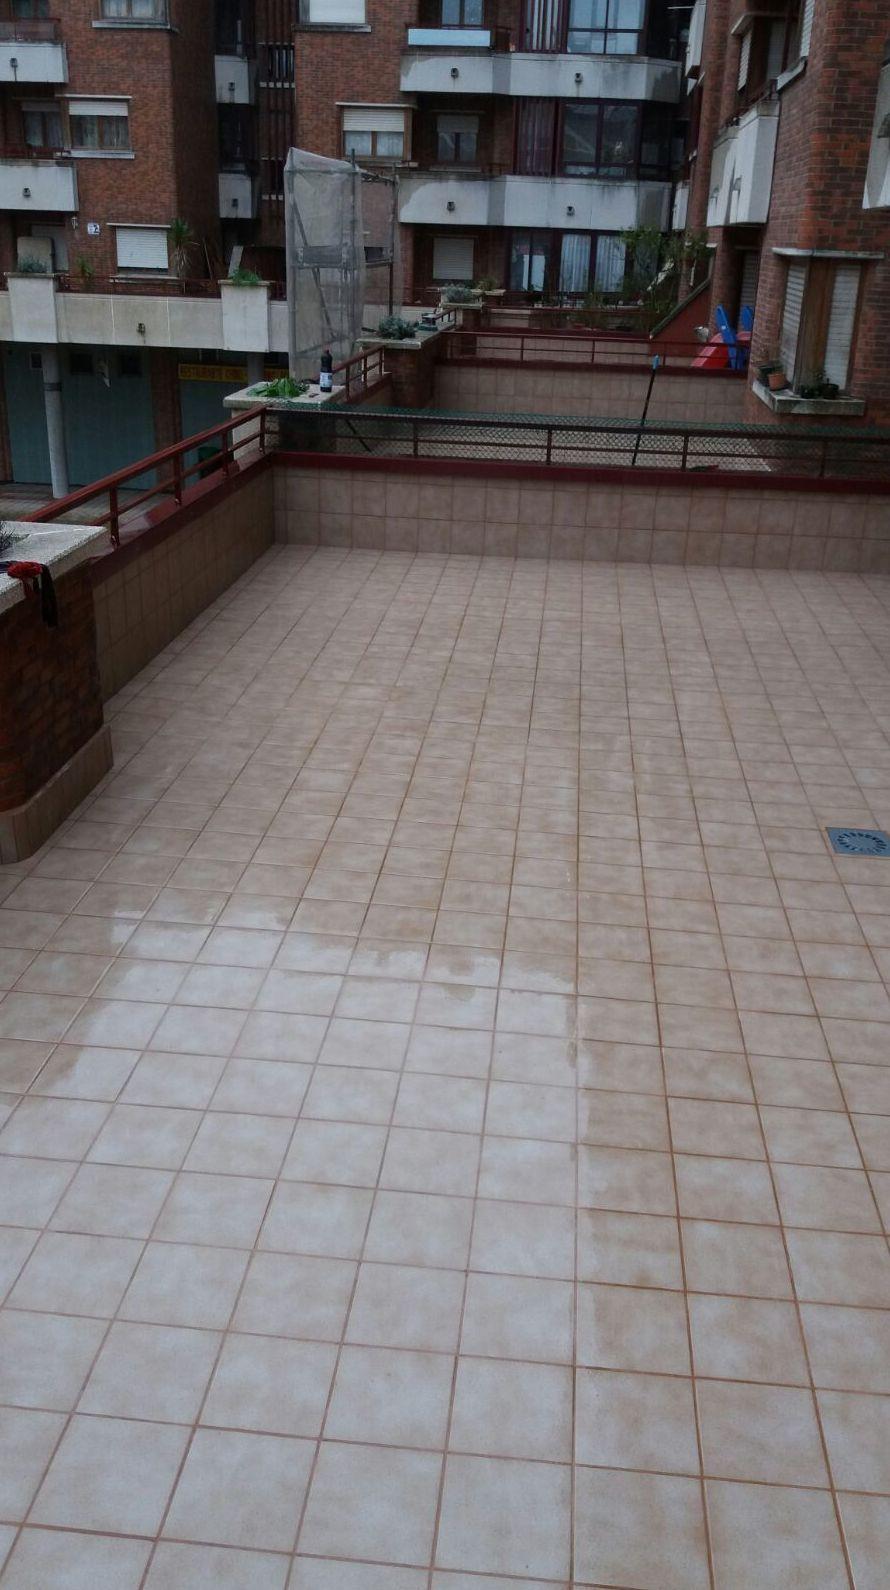 Foto 78 de Empresa de reformas en Oviedo | Asturcore